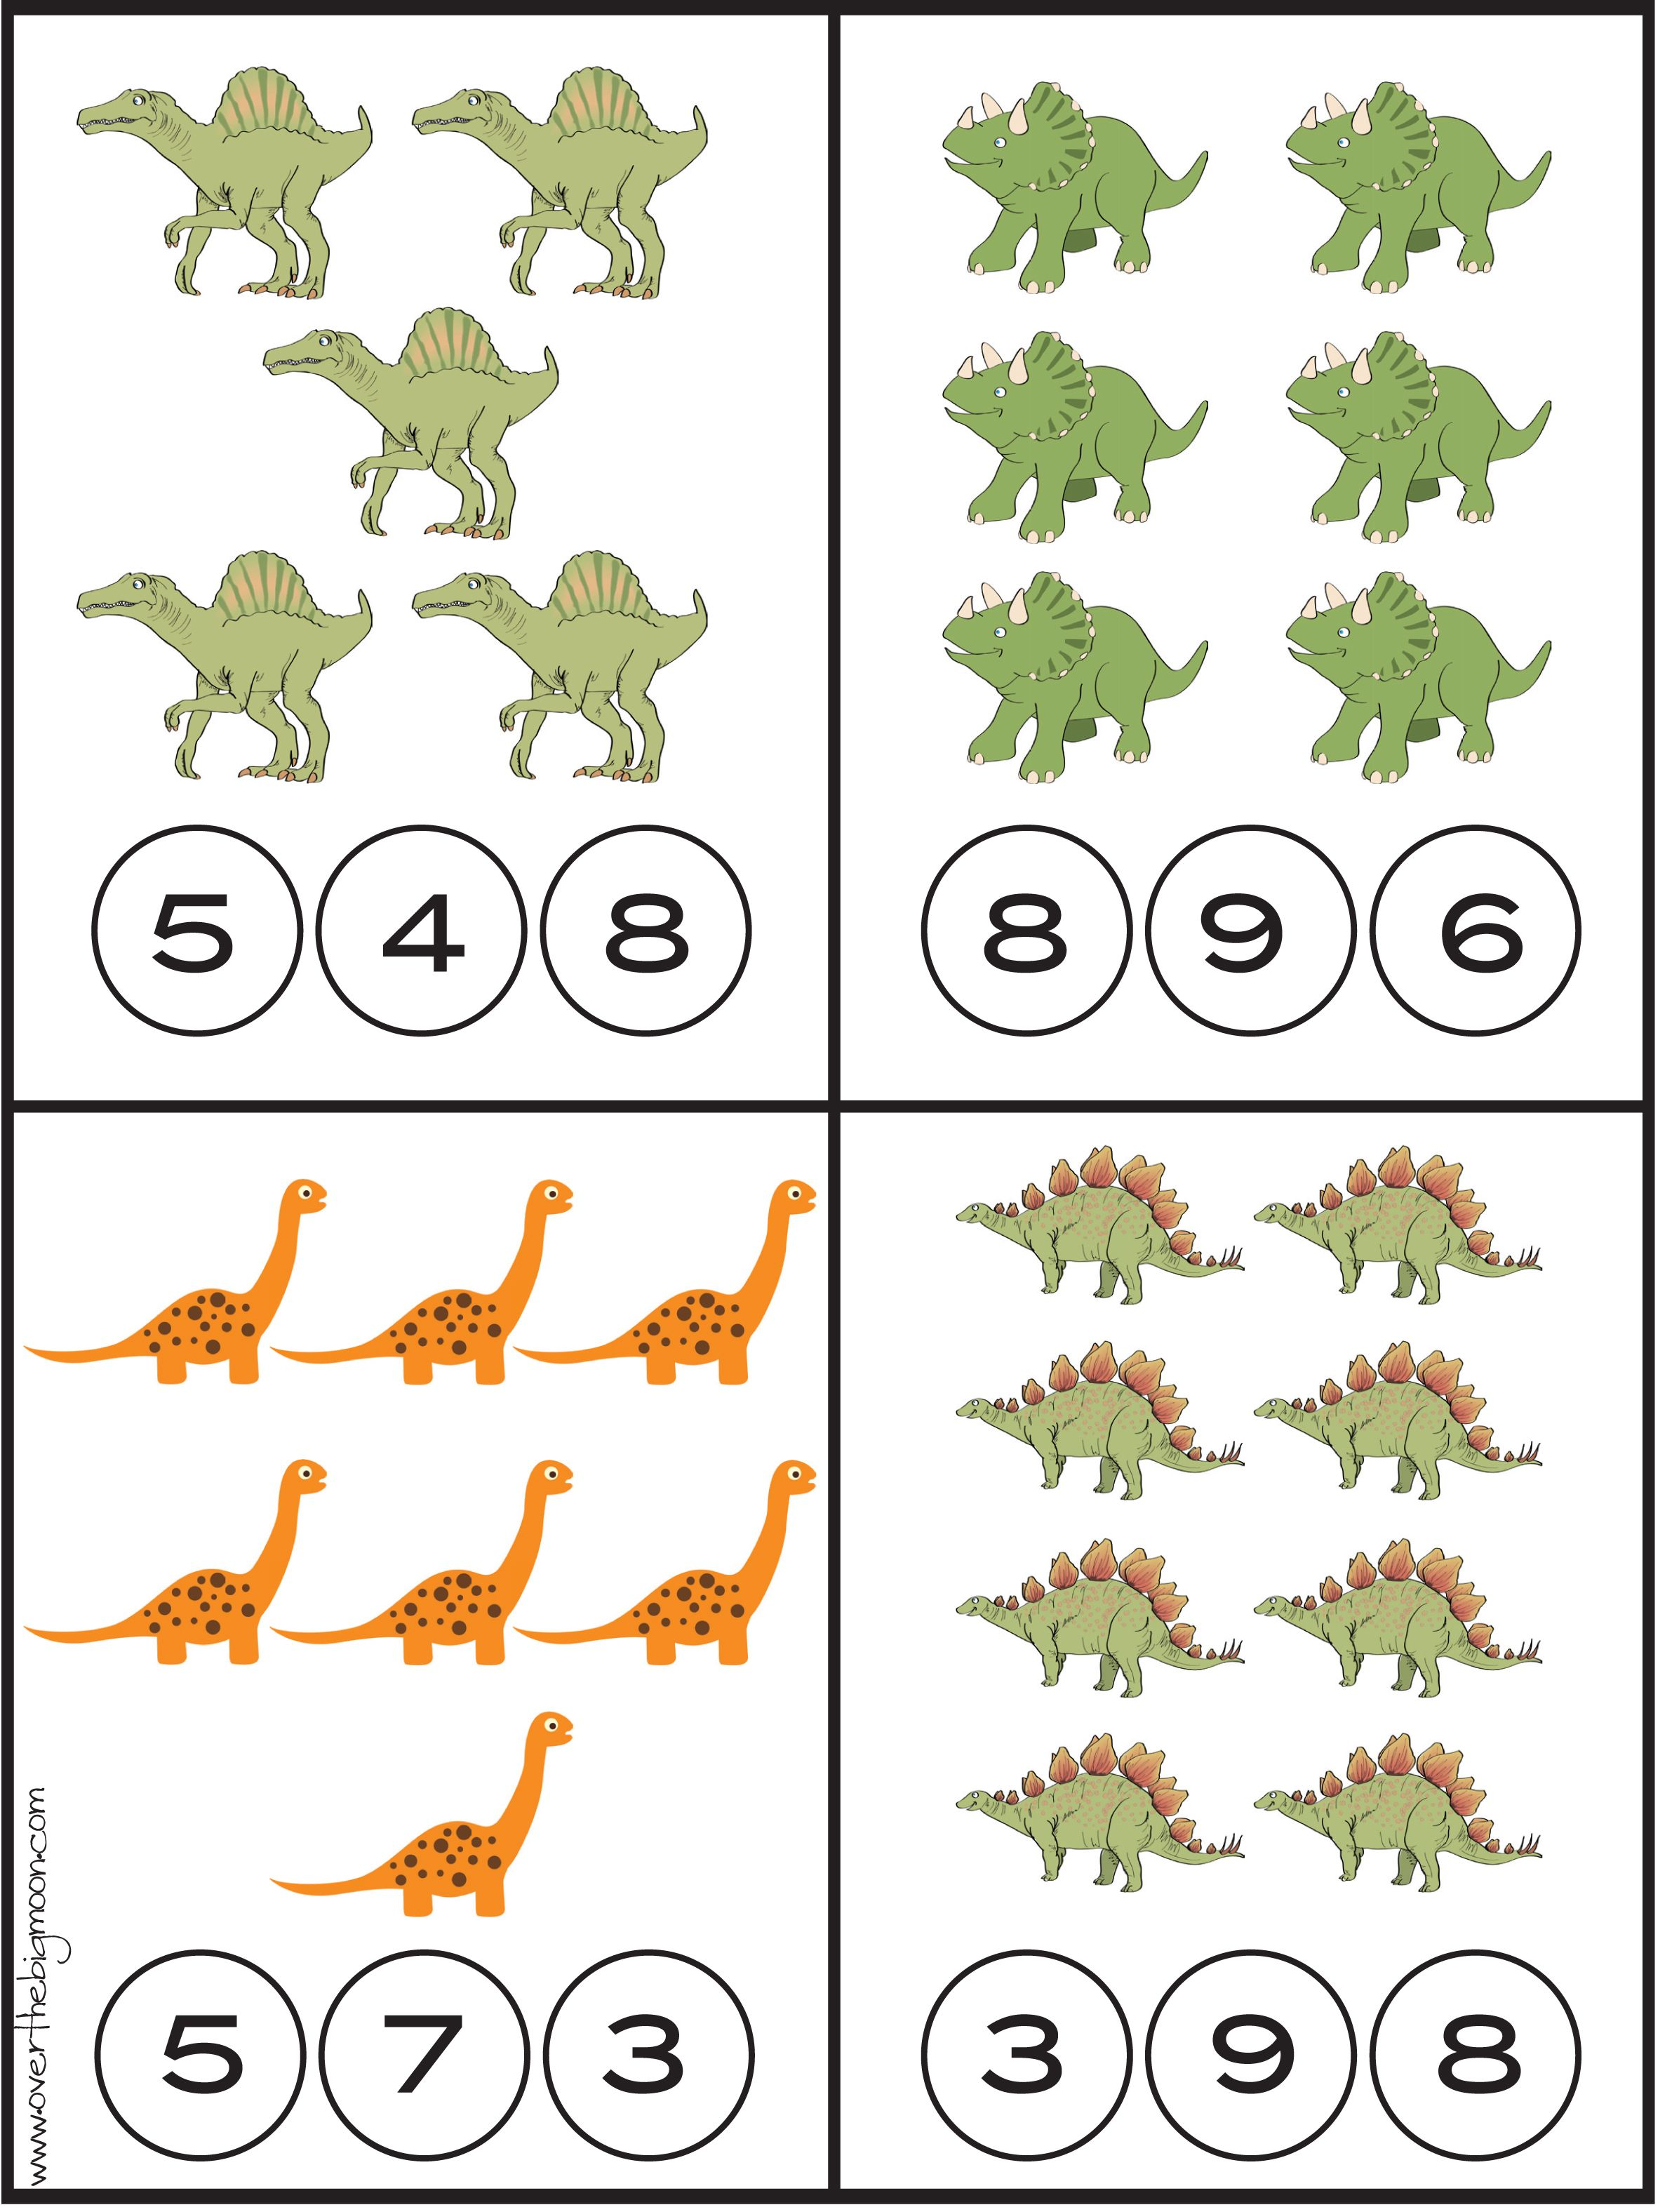 werkblad rekenen dino 39 s preschool dinosaurs dinosaurs preschool preschool math for kids. Black Bedroom Furniture Sets. Home Design Ideas